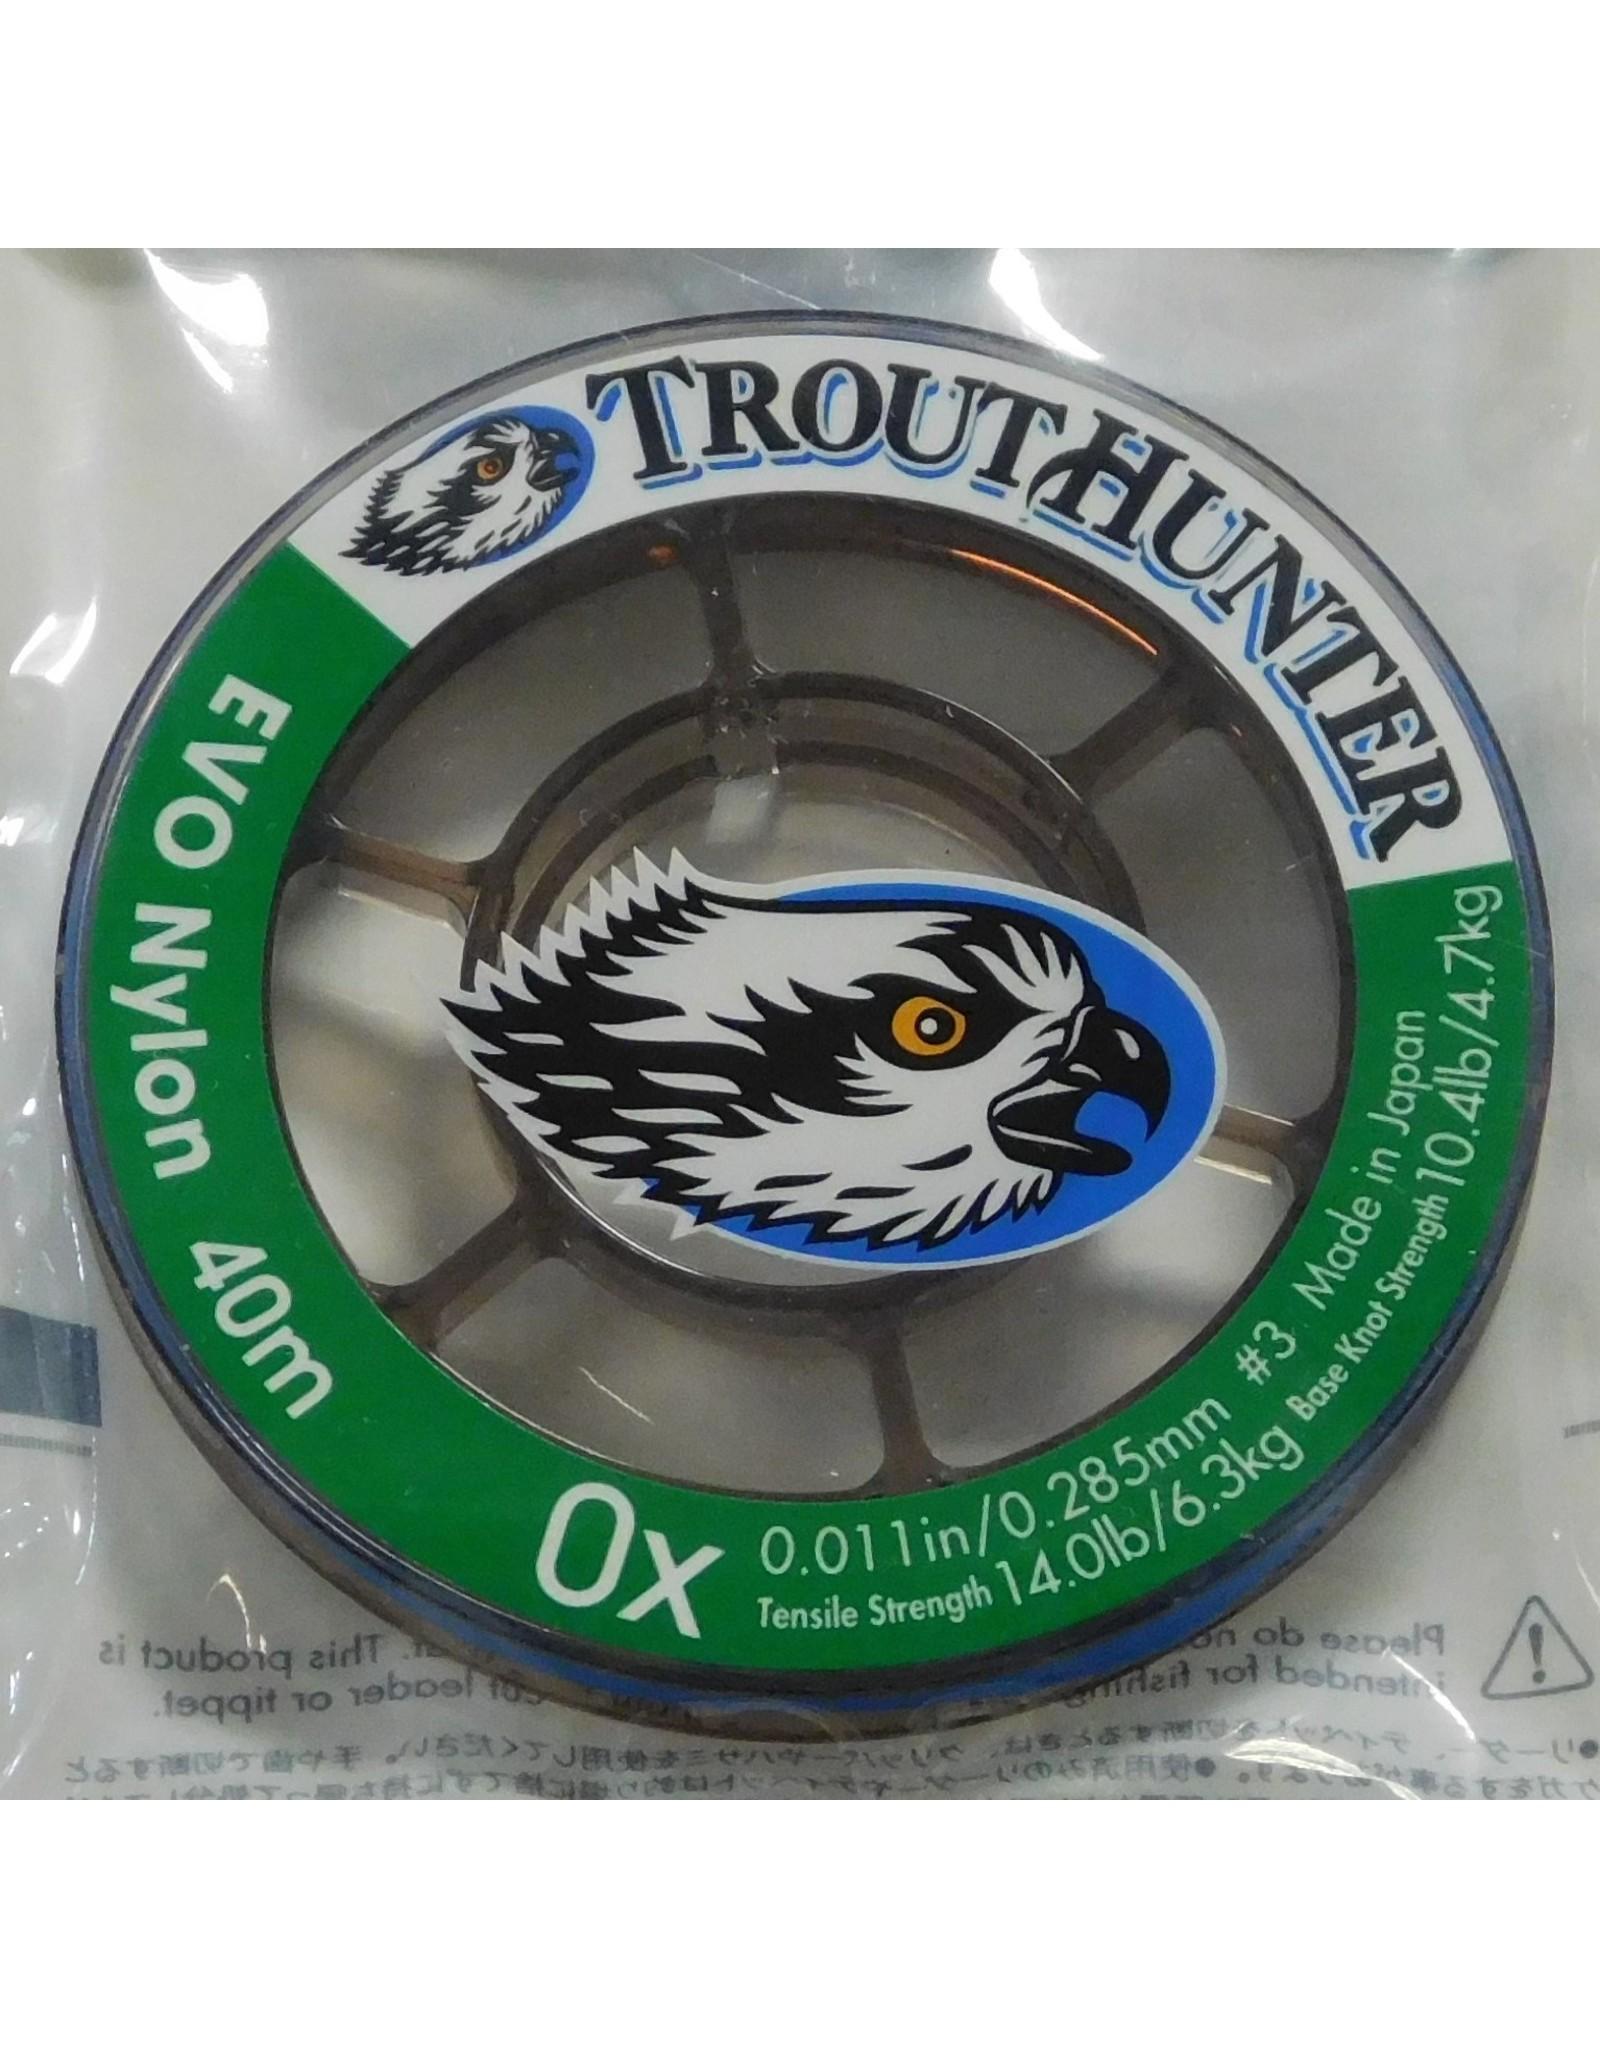 Trouthunter Trouthunter EVO Nylon Tippet 0X 40m